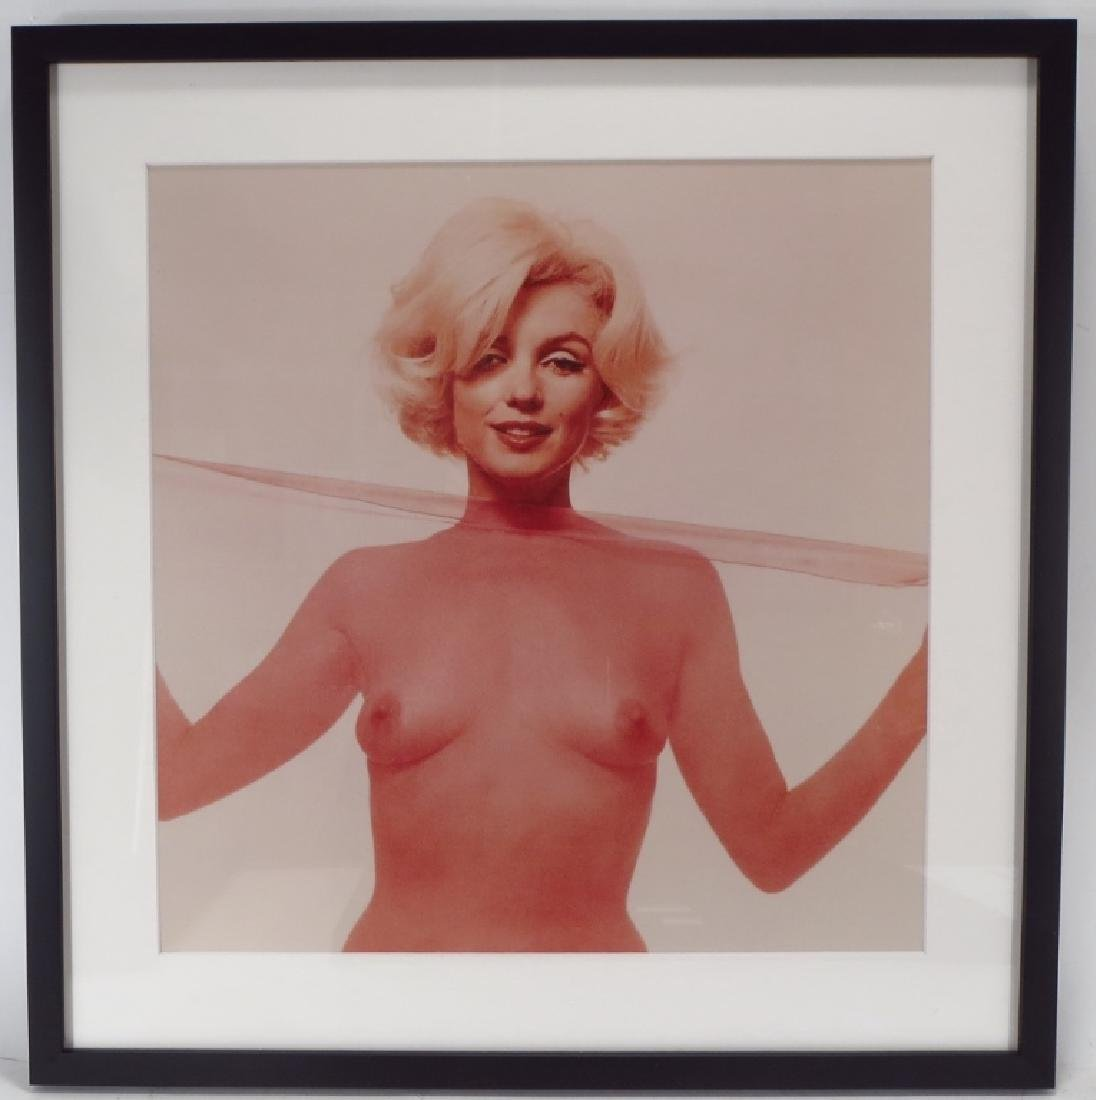 Bert Stern, 1929-2013, Marilyn Monroe, 2 Photos - 2